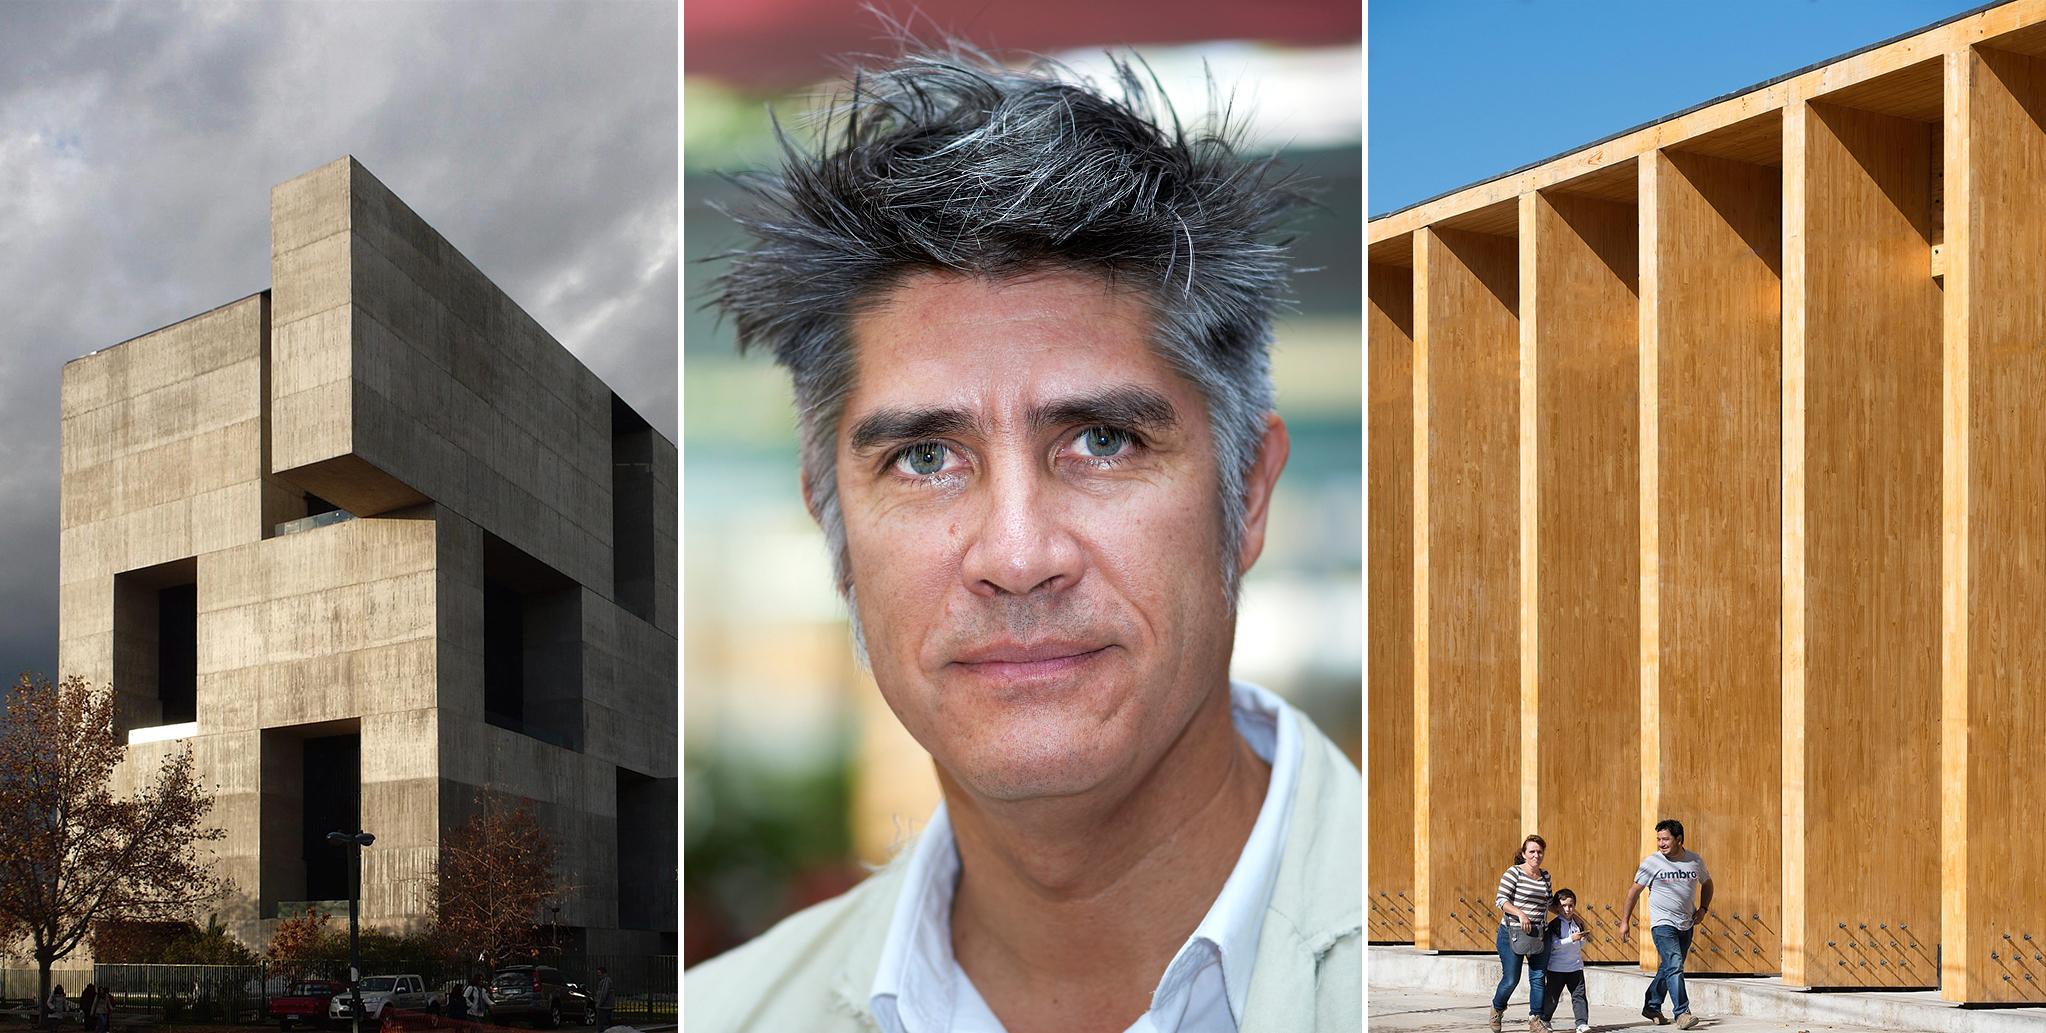 2016 Pritzker Prize Goes to Alejandro Aravena, Chilean Architect Behind Innovative Affordable Housing